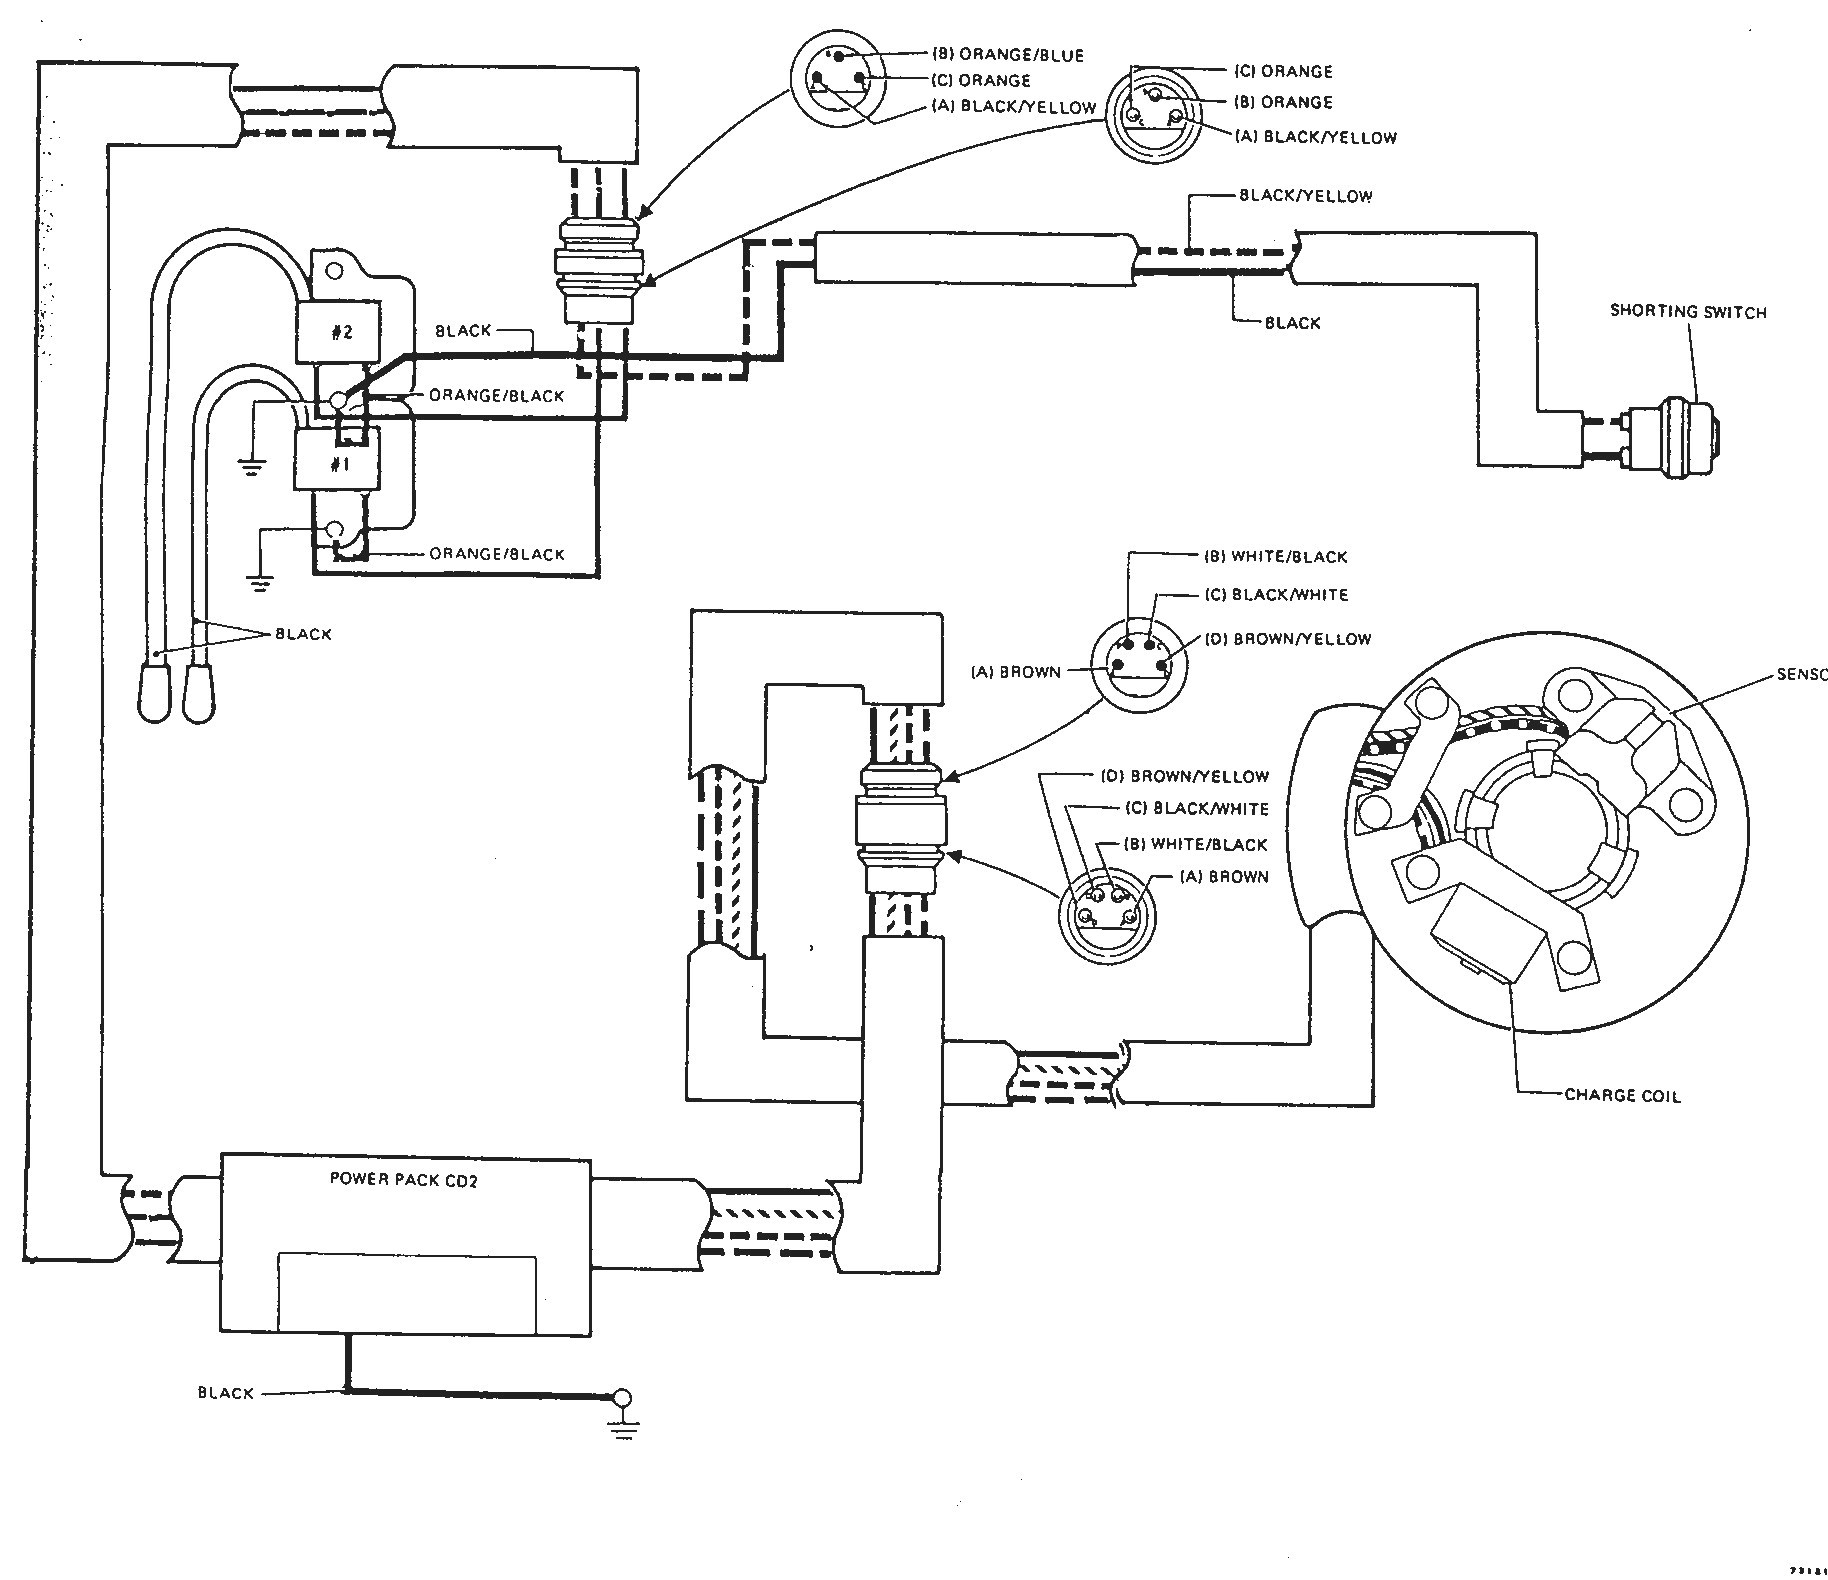 Reversing Starter Wiring Diagram Page 3 And Cutler Hammer Schematics Beautiful